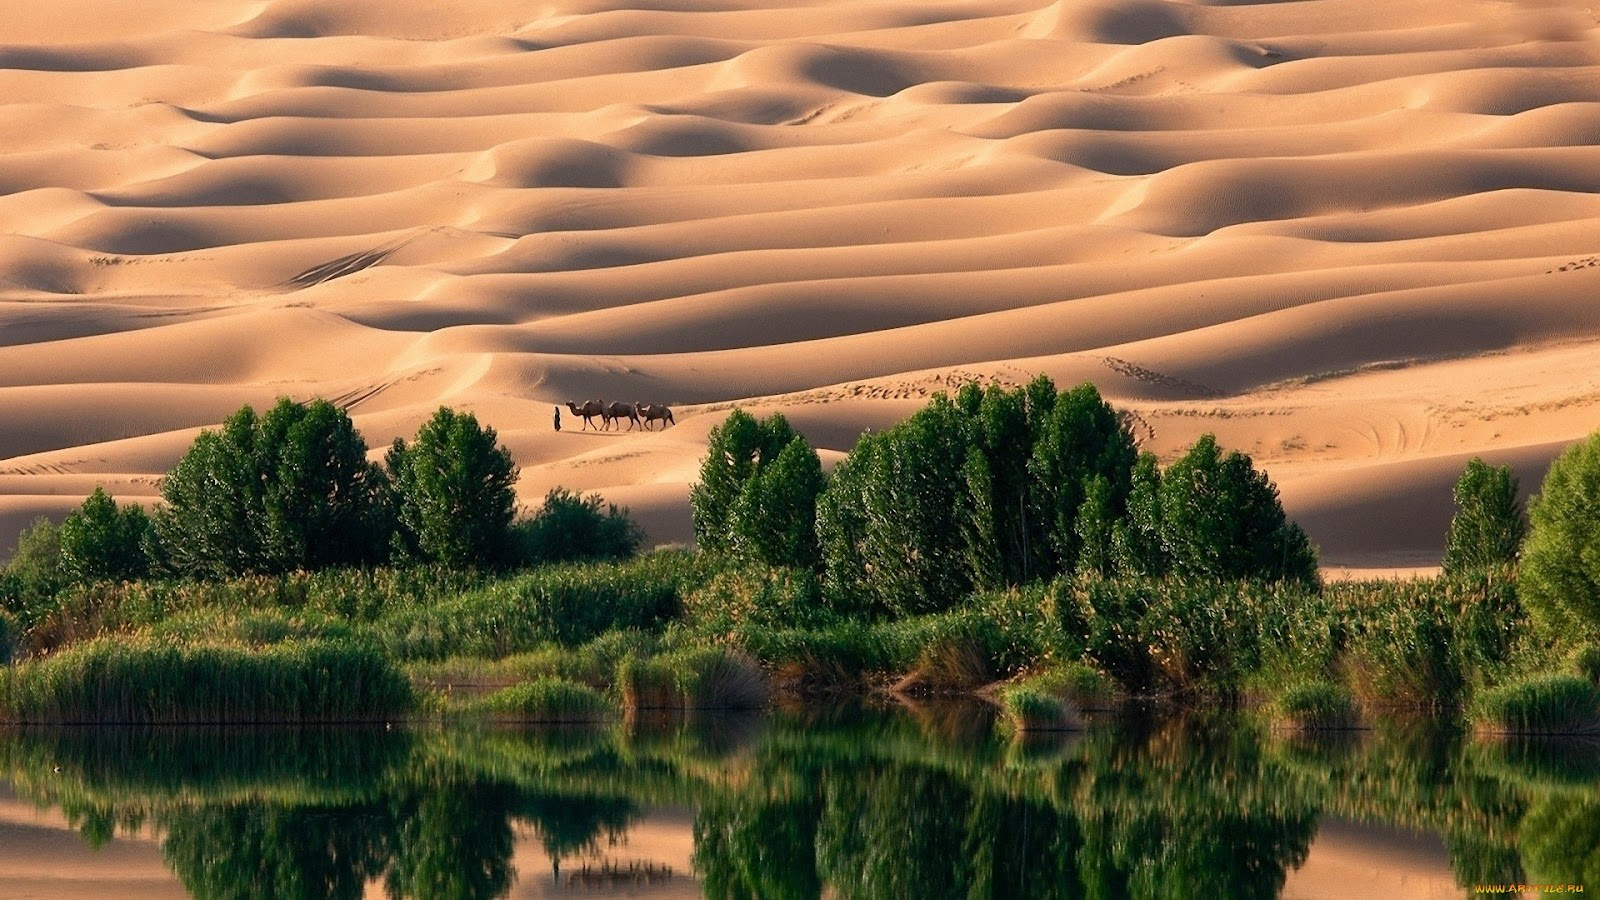 TISOTIT: Desert Oasis Wallpaper